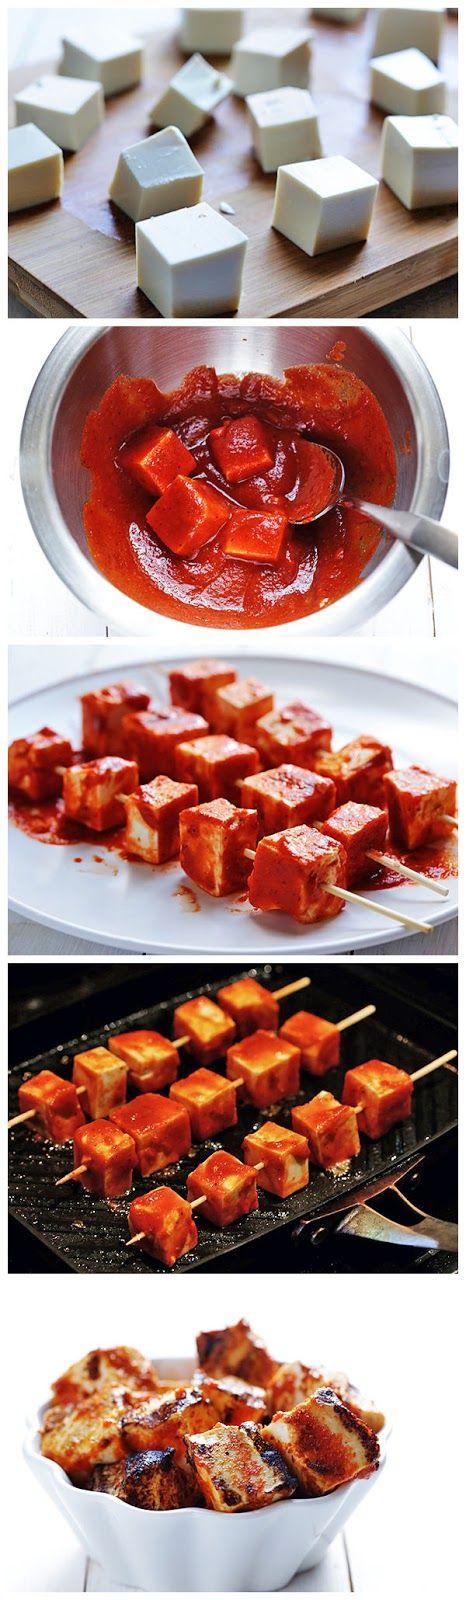 Spicy Sriracha Grilled Tofu | Kaia BRIK Recipes | Pinterest